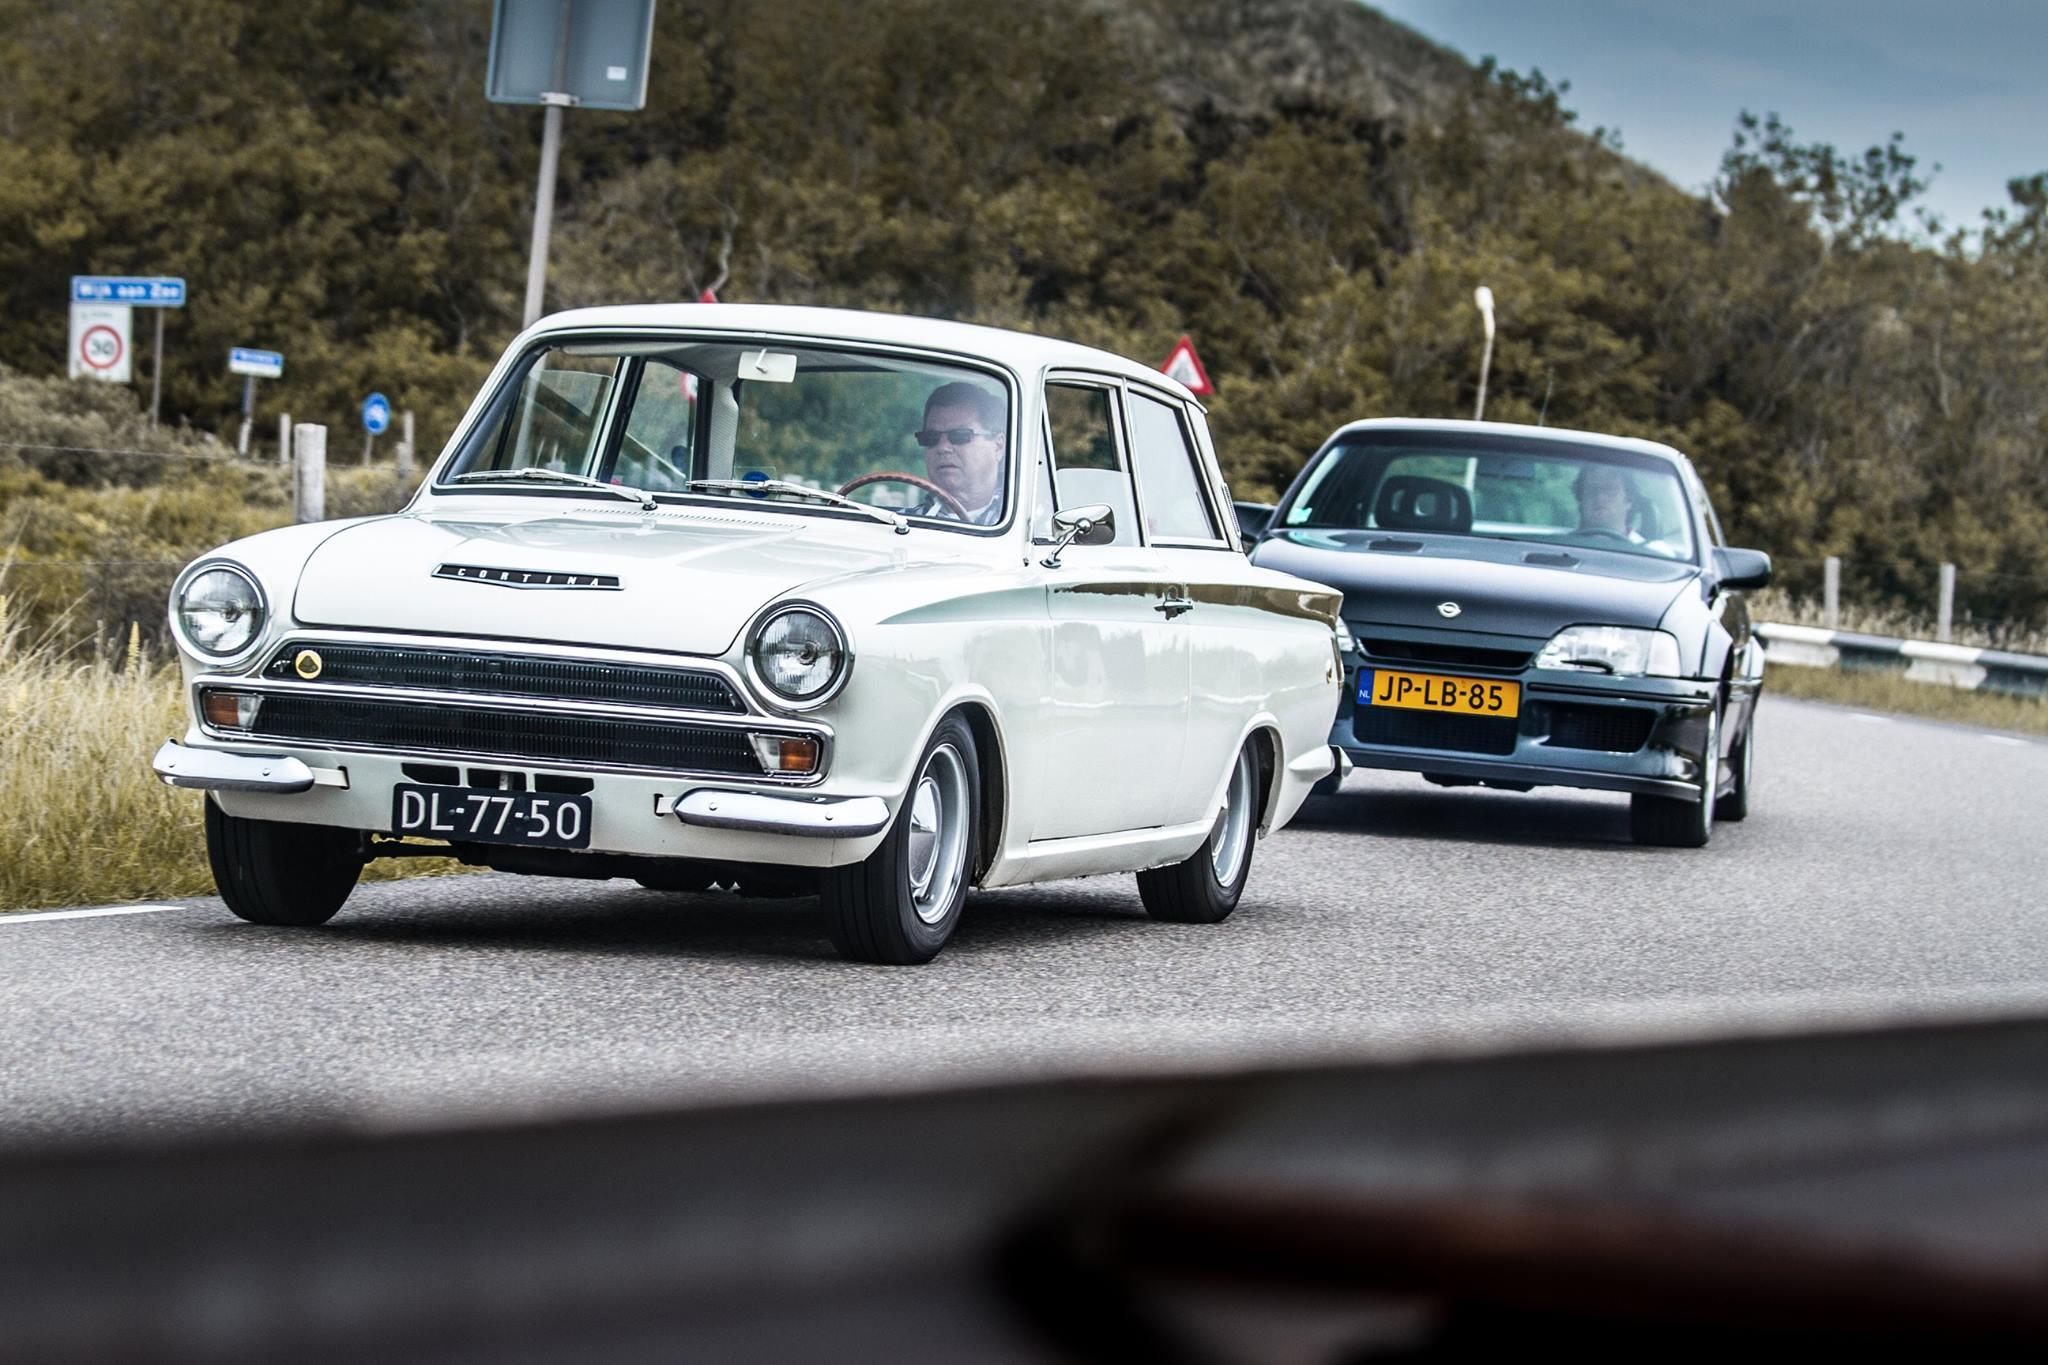 Lotus Cortina en Lotus Omega - foto Luuk van Kaathoven